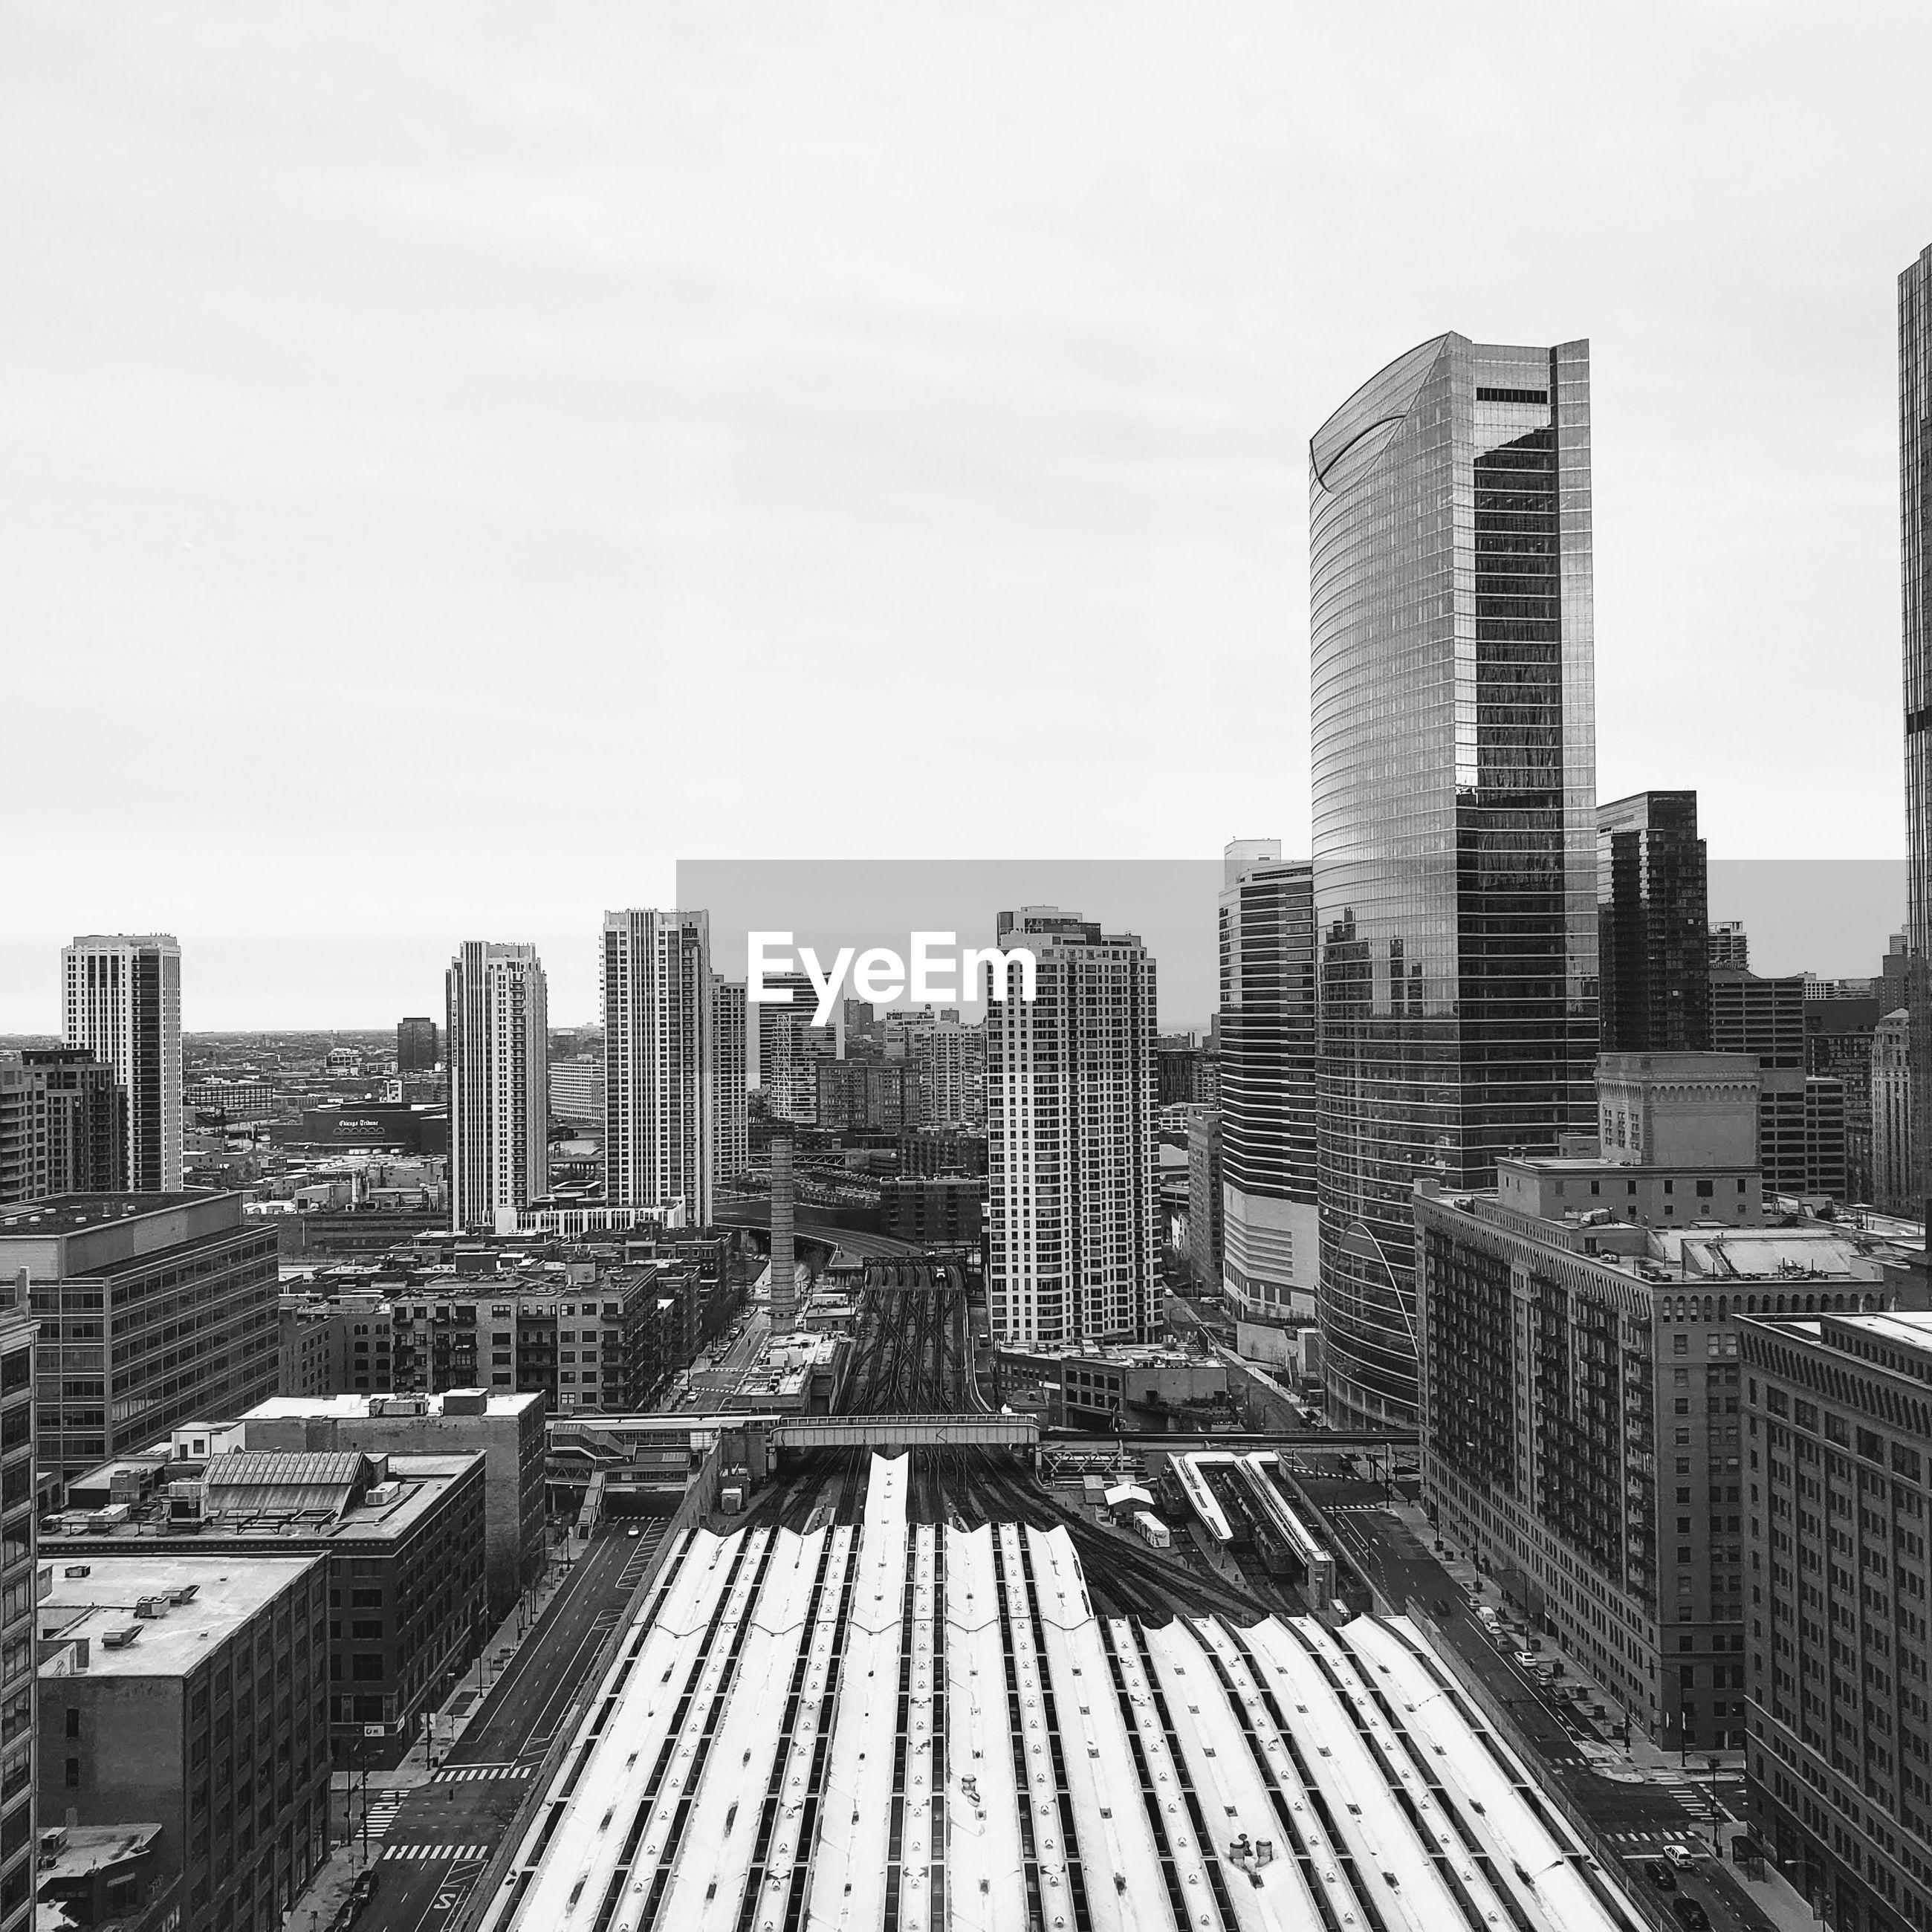 A city above ground